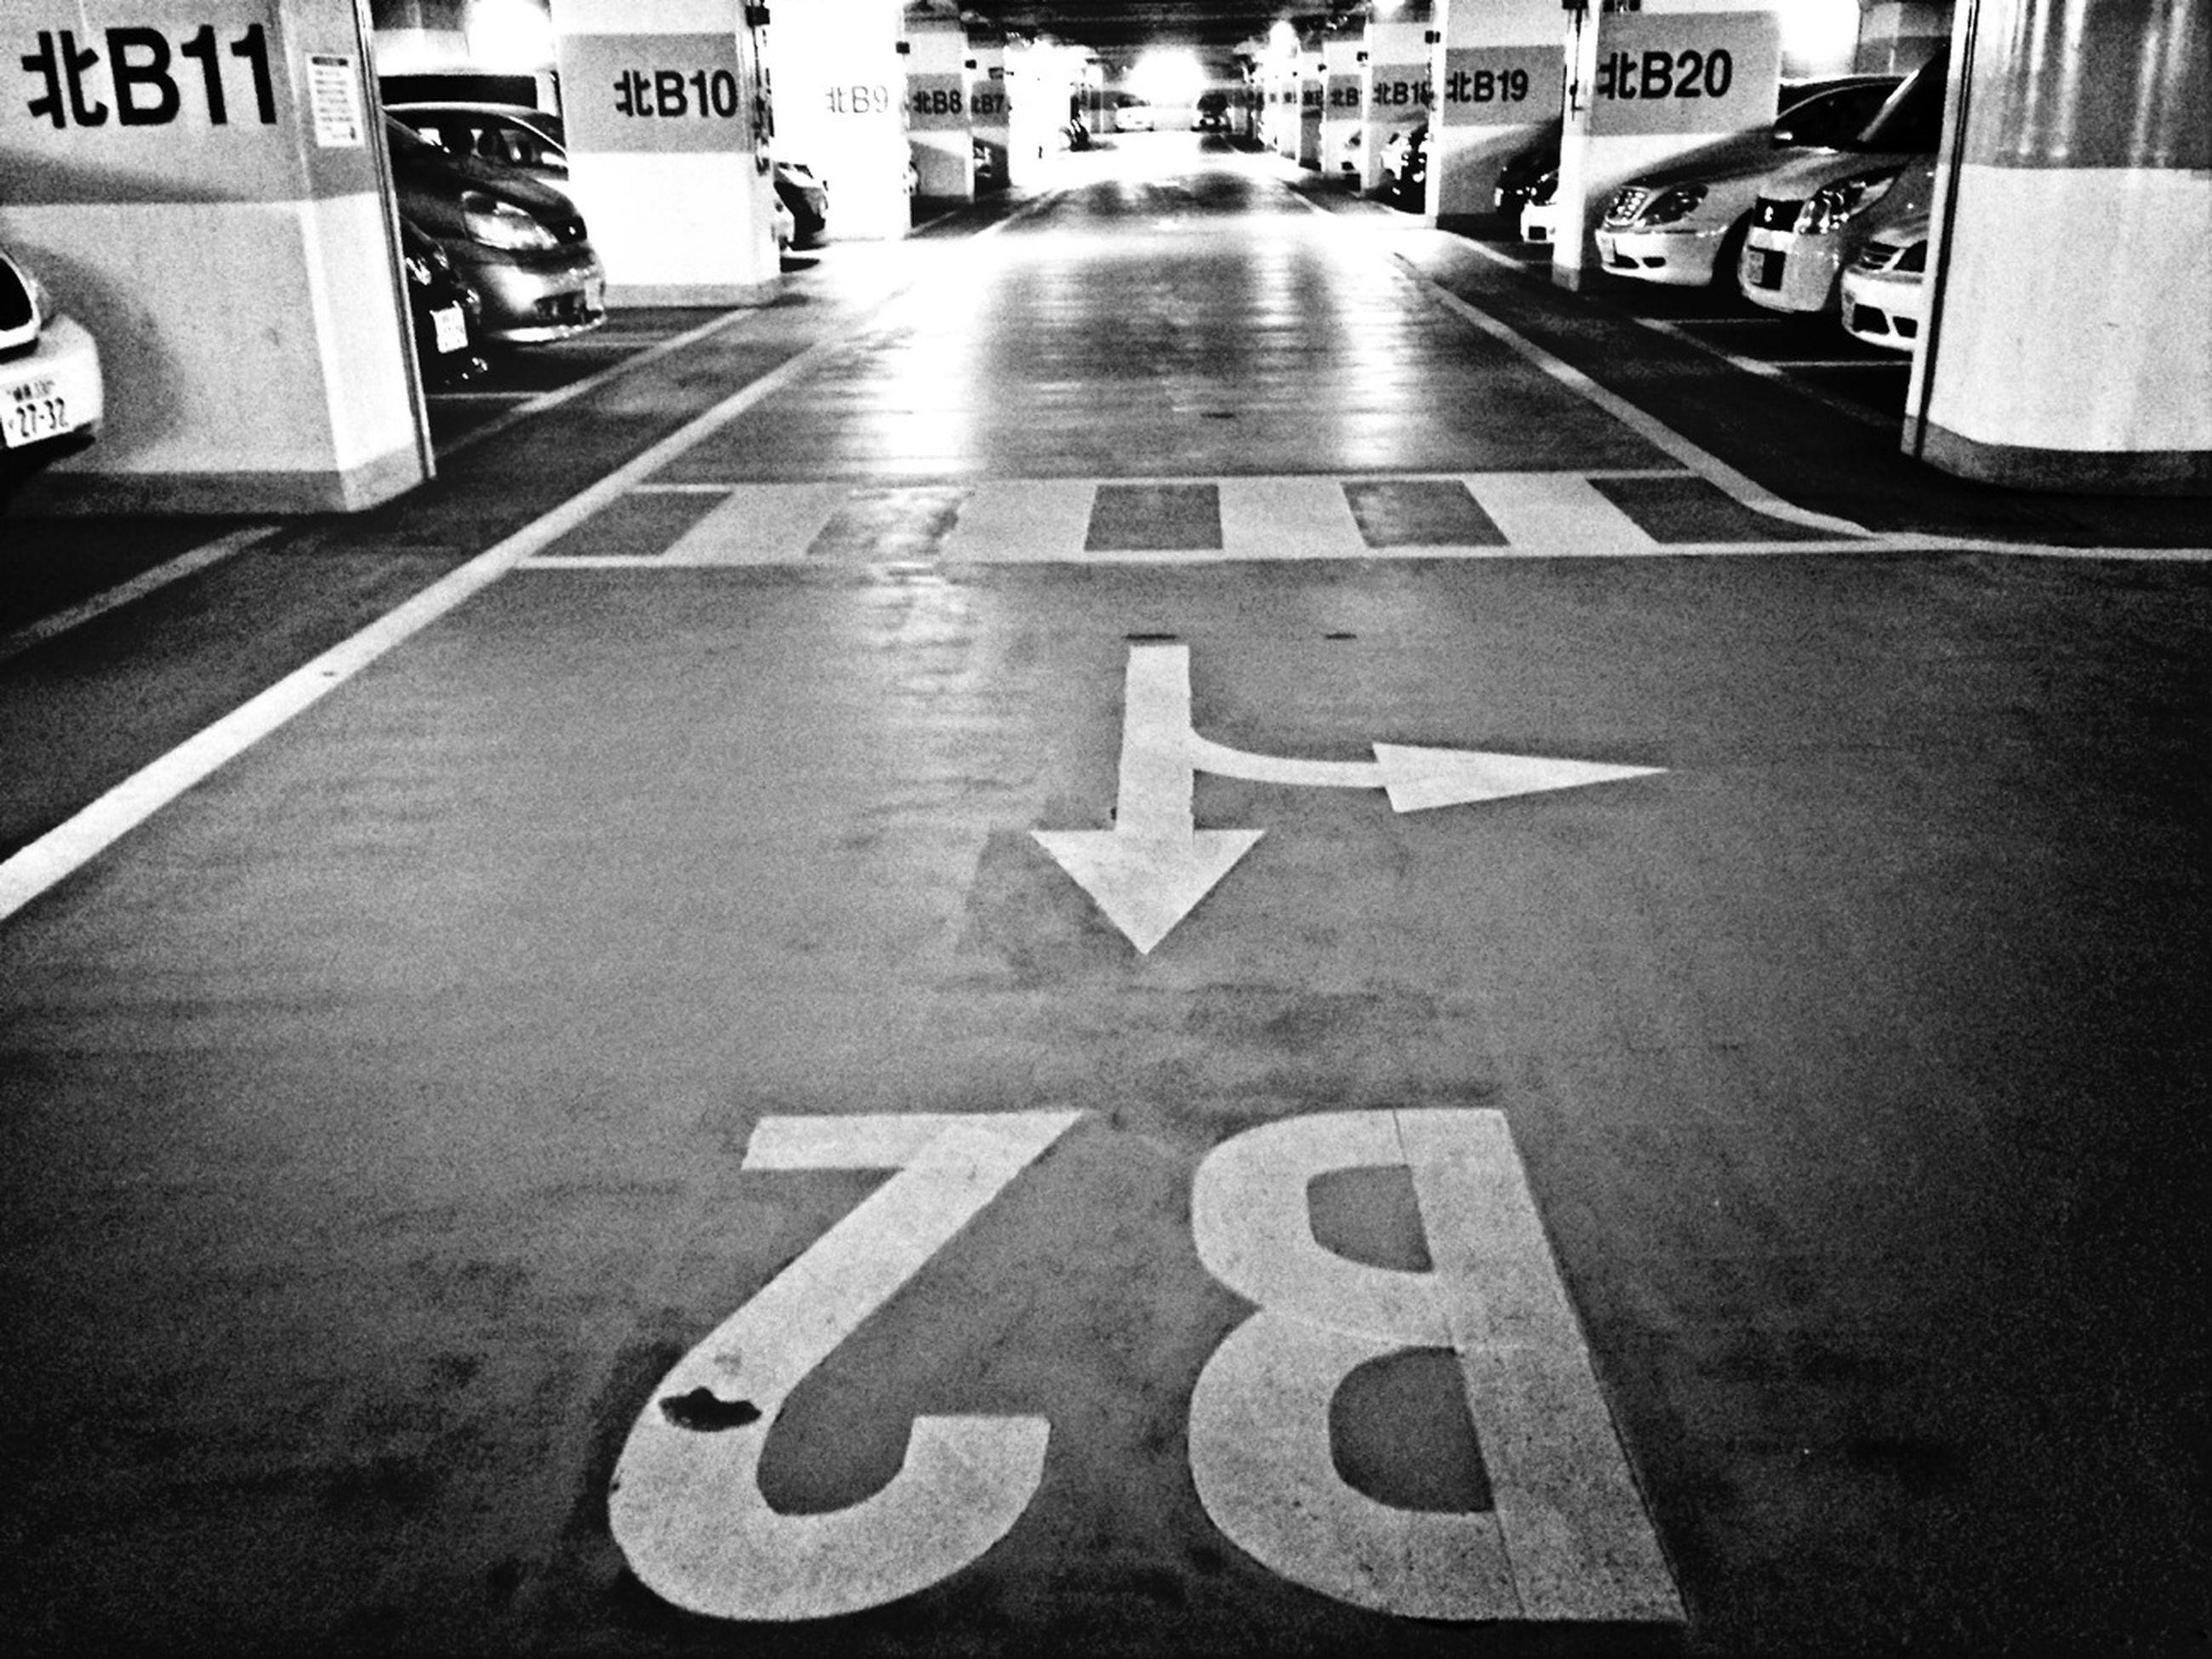 transportation, road marking, road, car, street, land vehicle, mode of transport, text, guidance, communication, asphalt, western script, arrow symbol, road sign, the way forward, sign, city, direction, information sign, directional sign